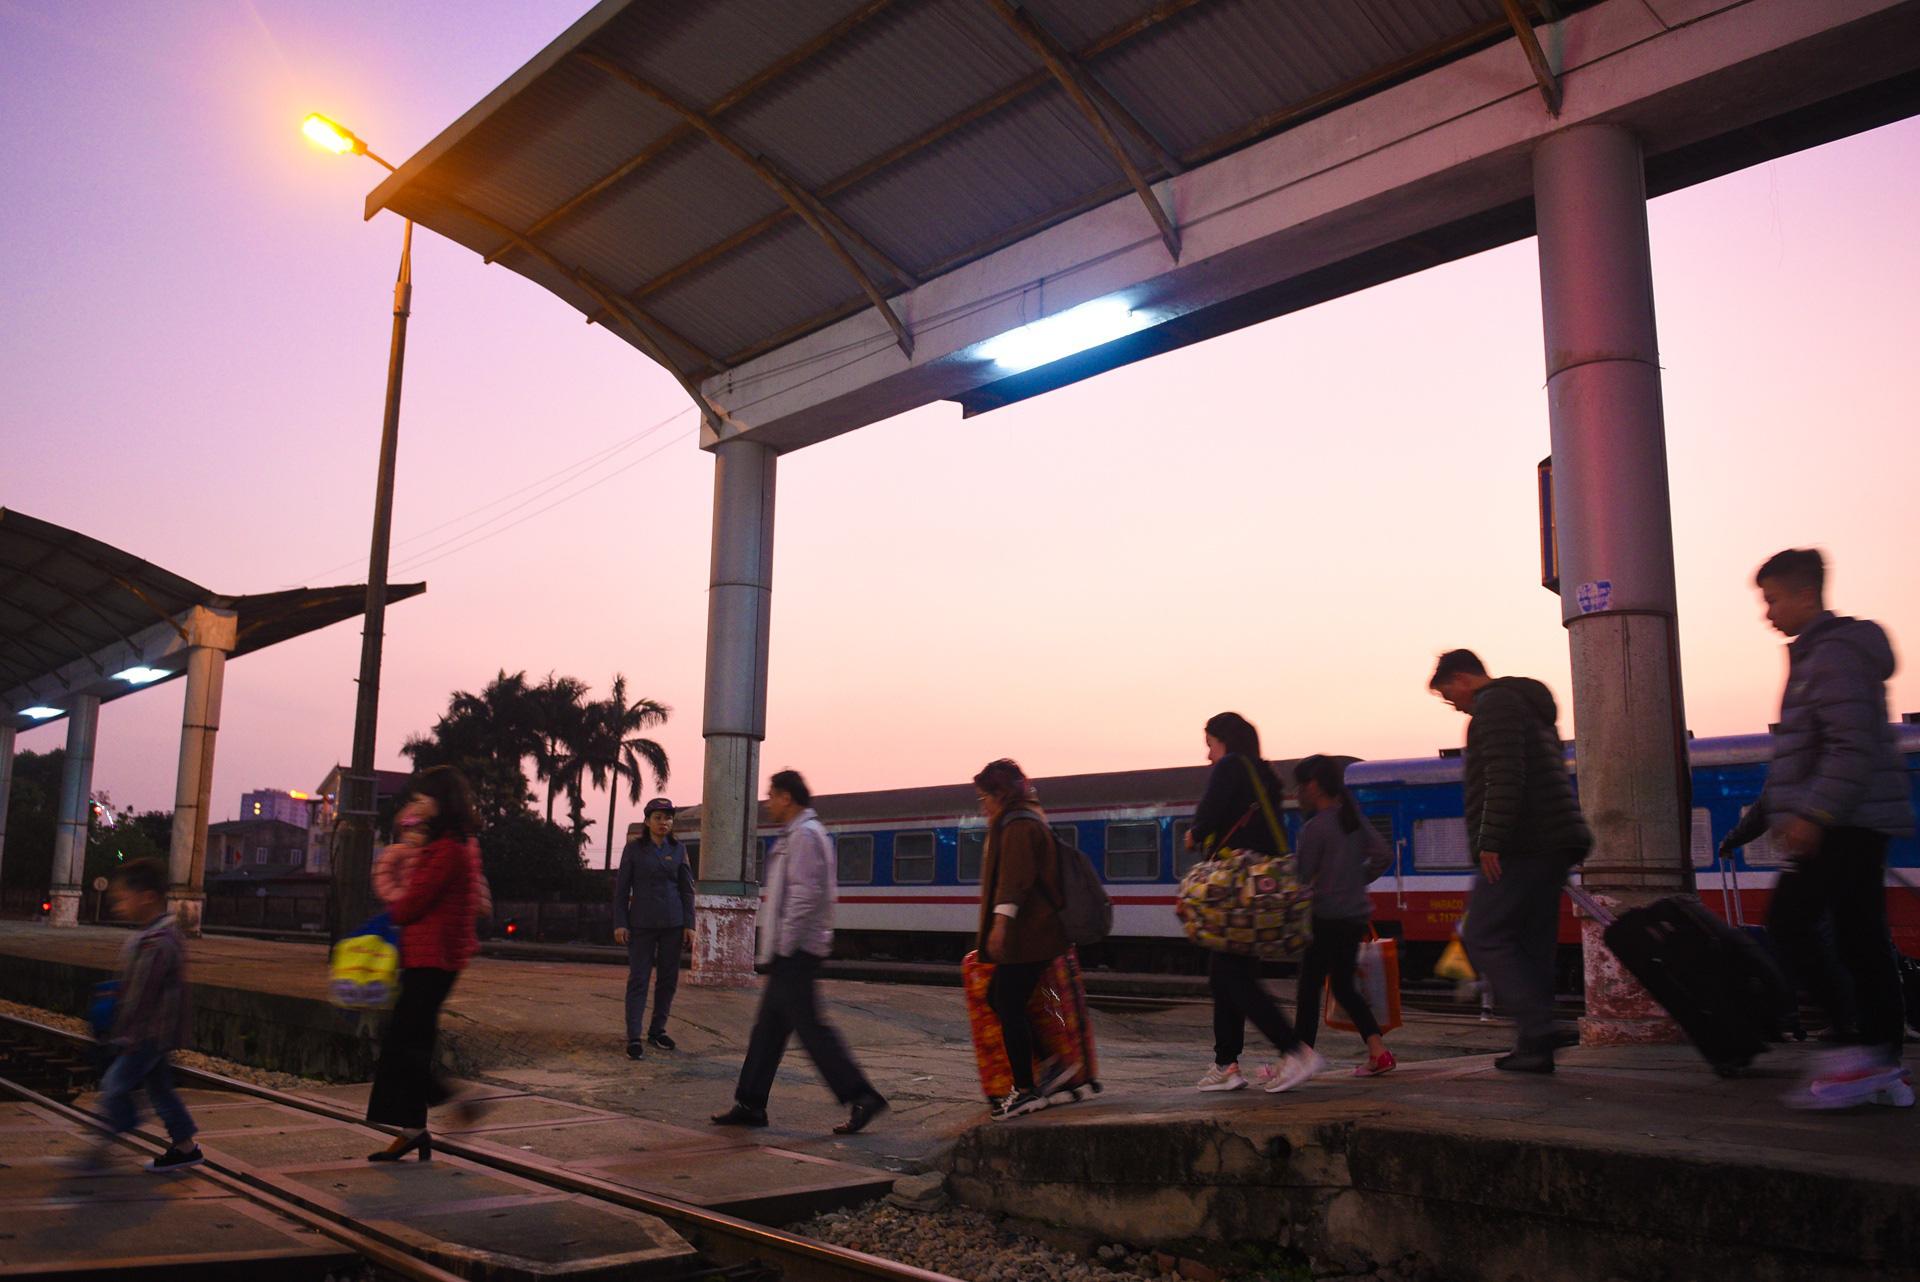 Tet tren nhung chuyen tau cuoi cung cua nam Ky Hoi hinh anh 10 DSC_1443_zing.jpg